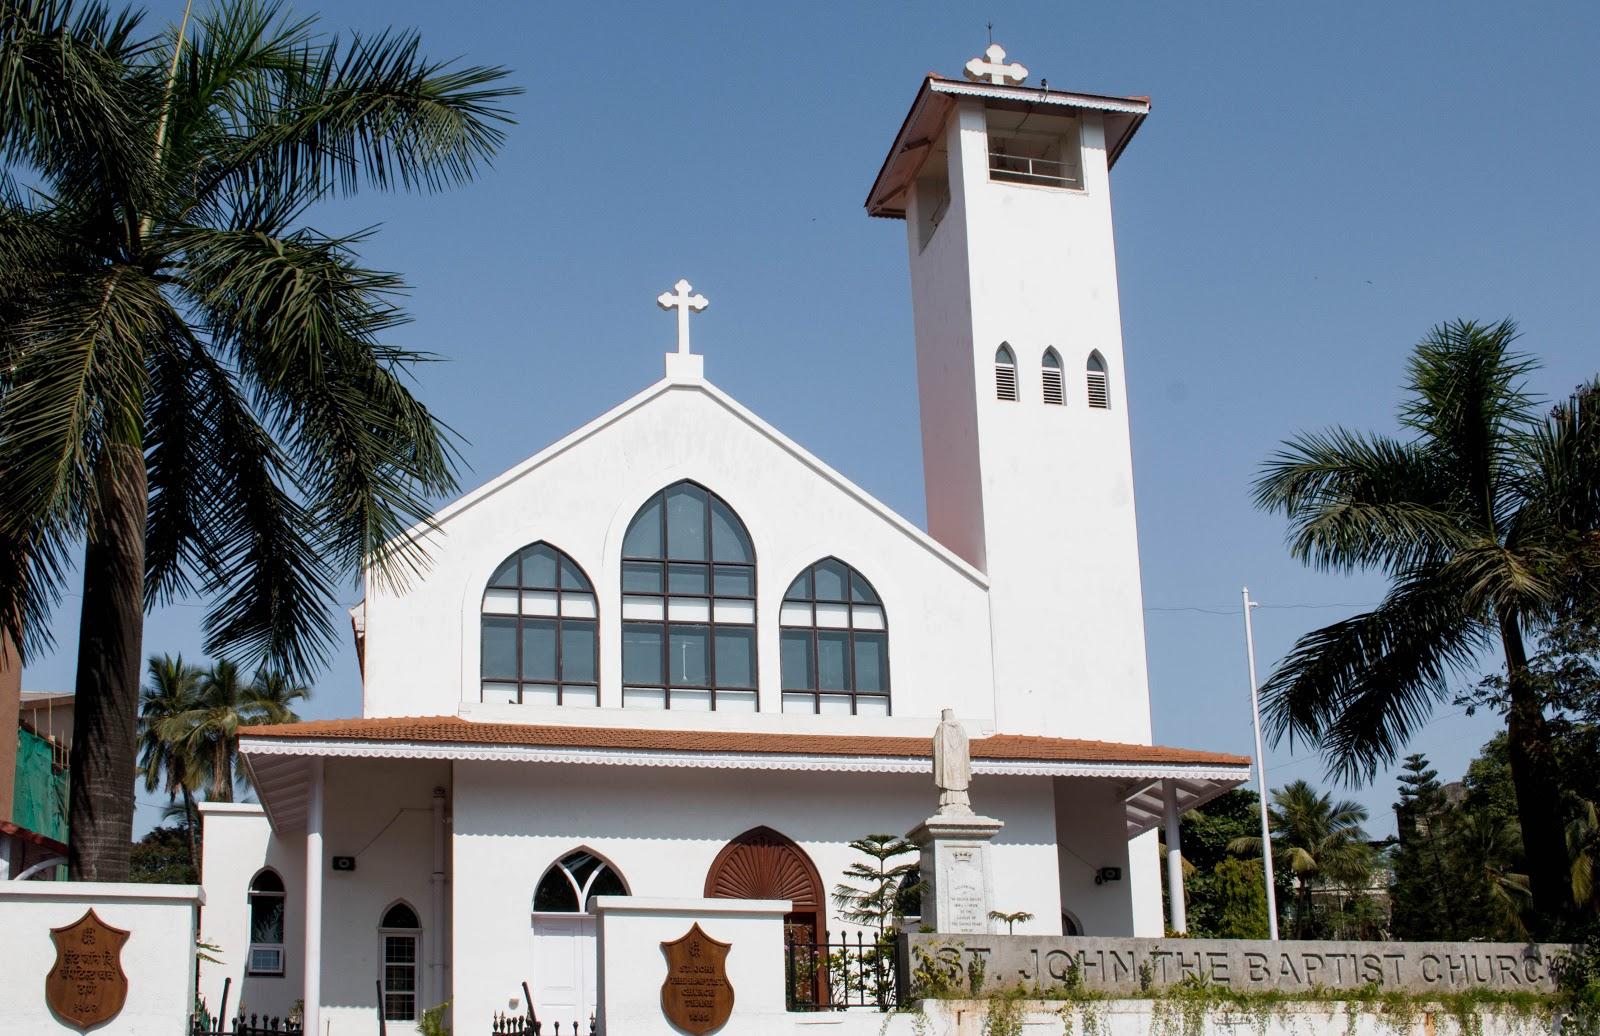 St. John's The Baptist Church